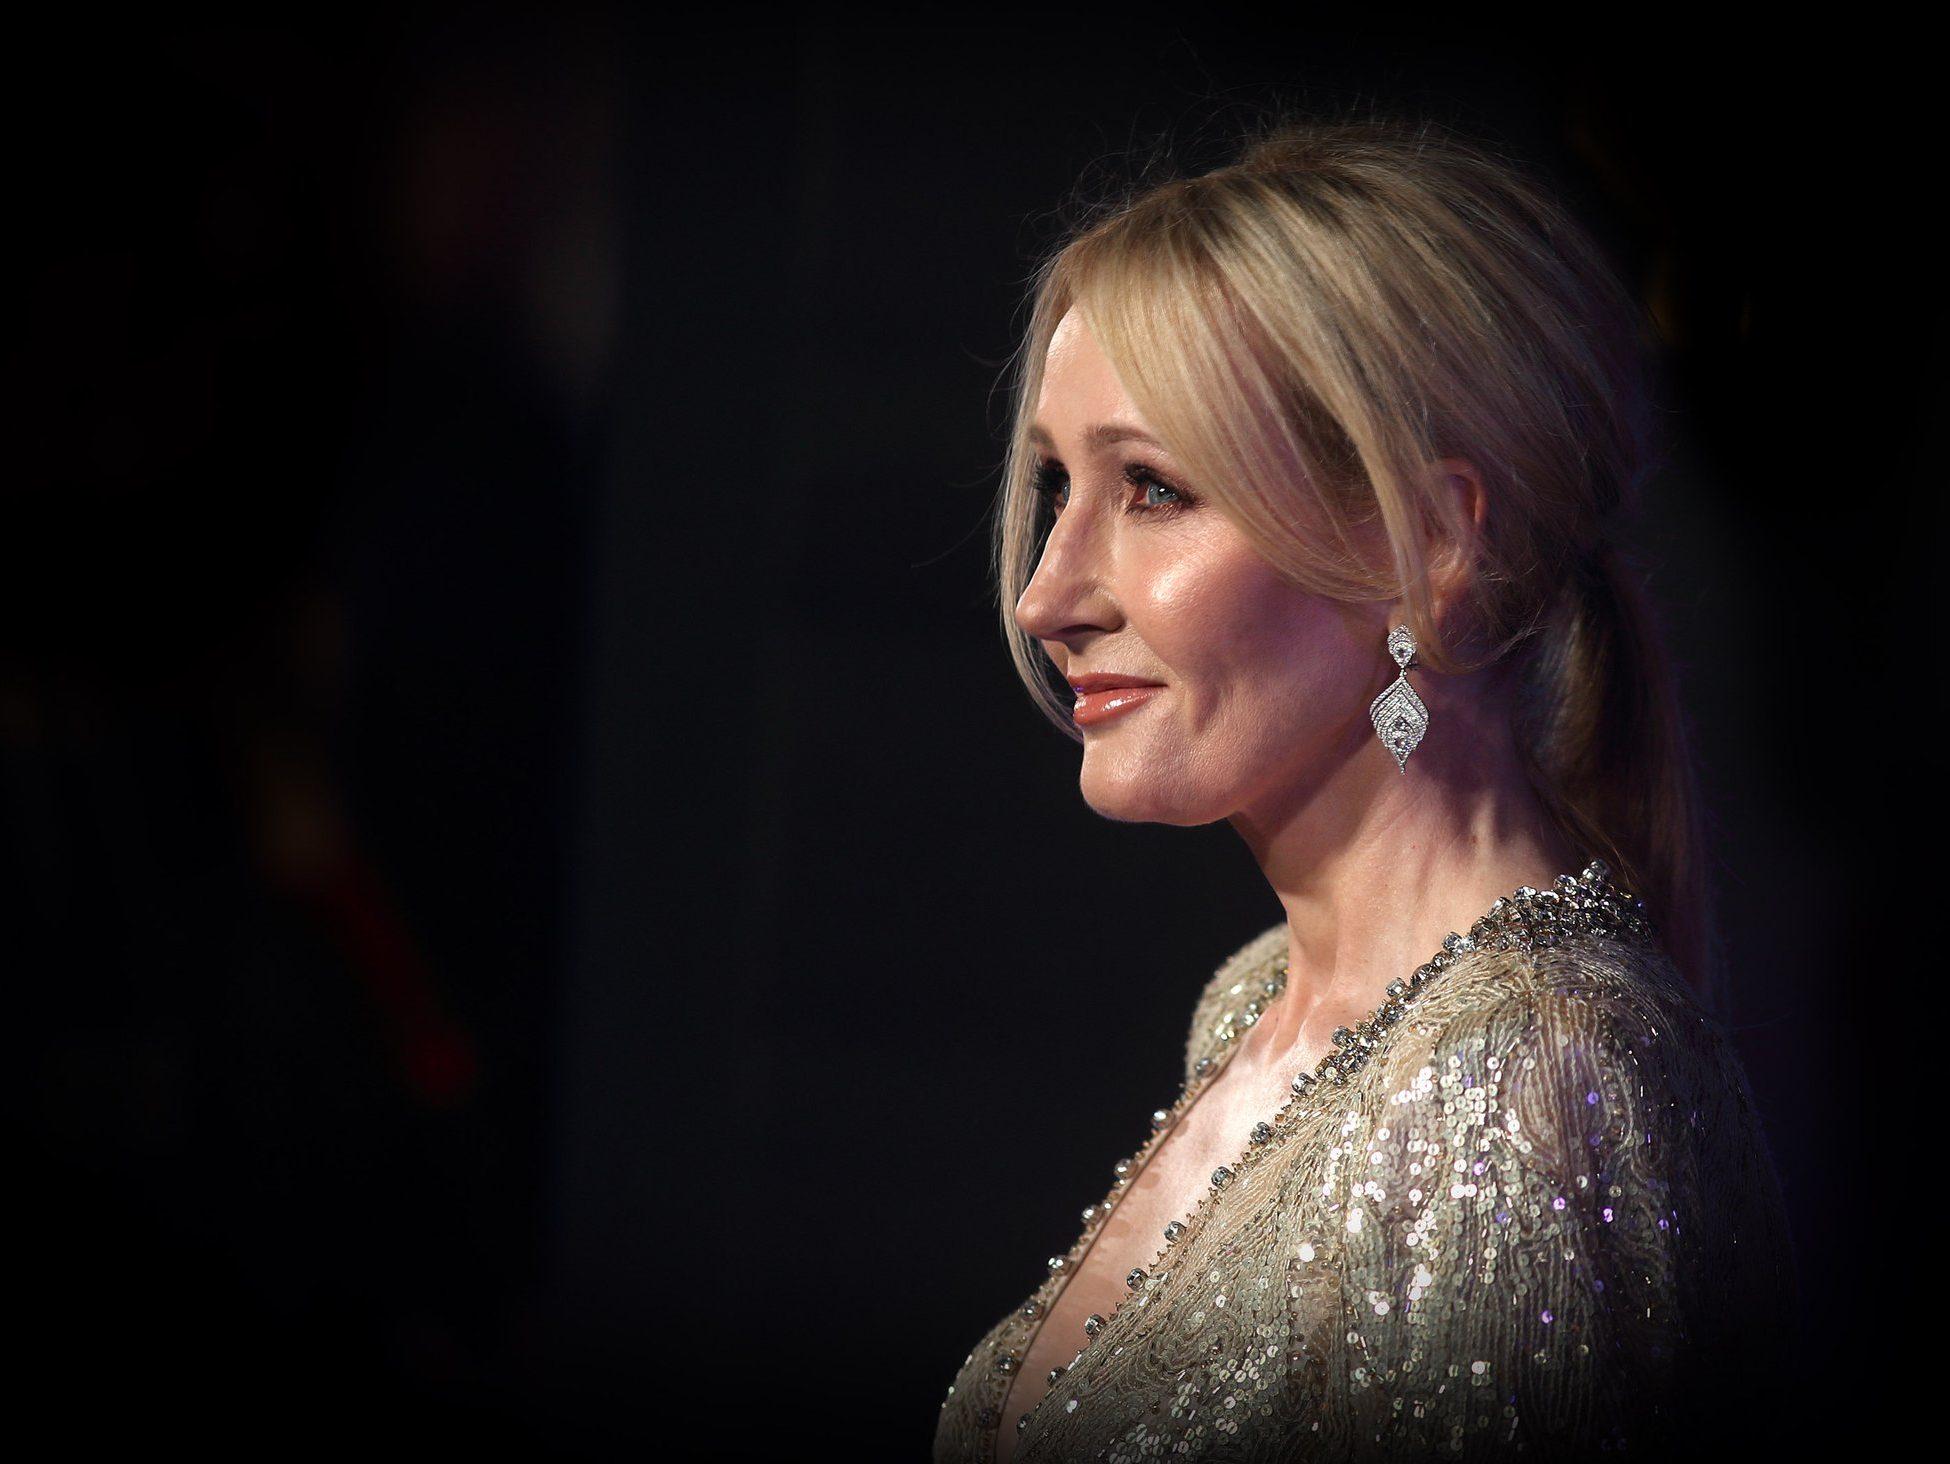 J.K. Rowling, autora de Harry Potter, es activa en Twitter